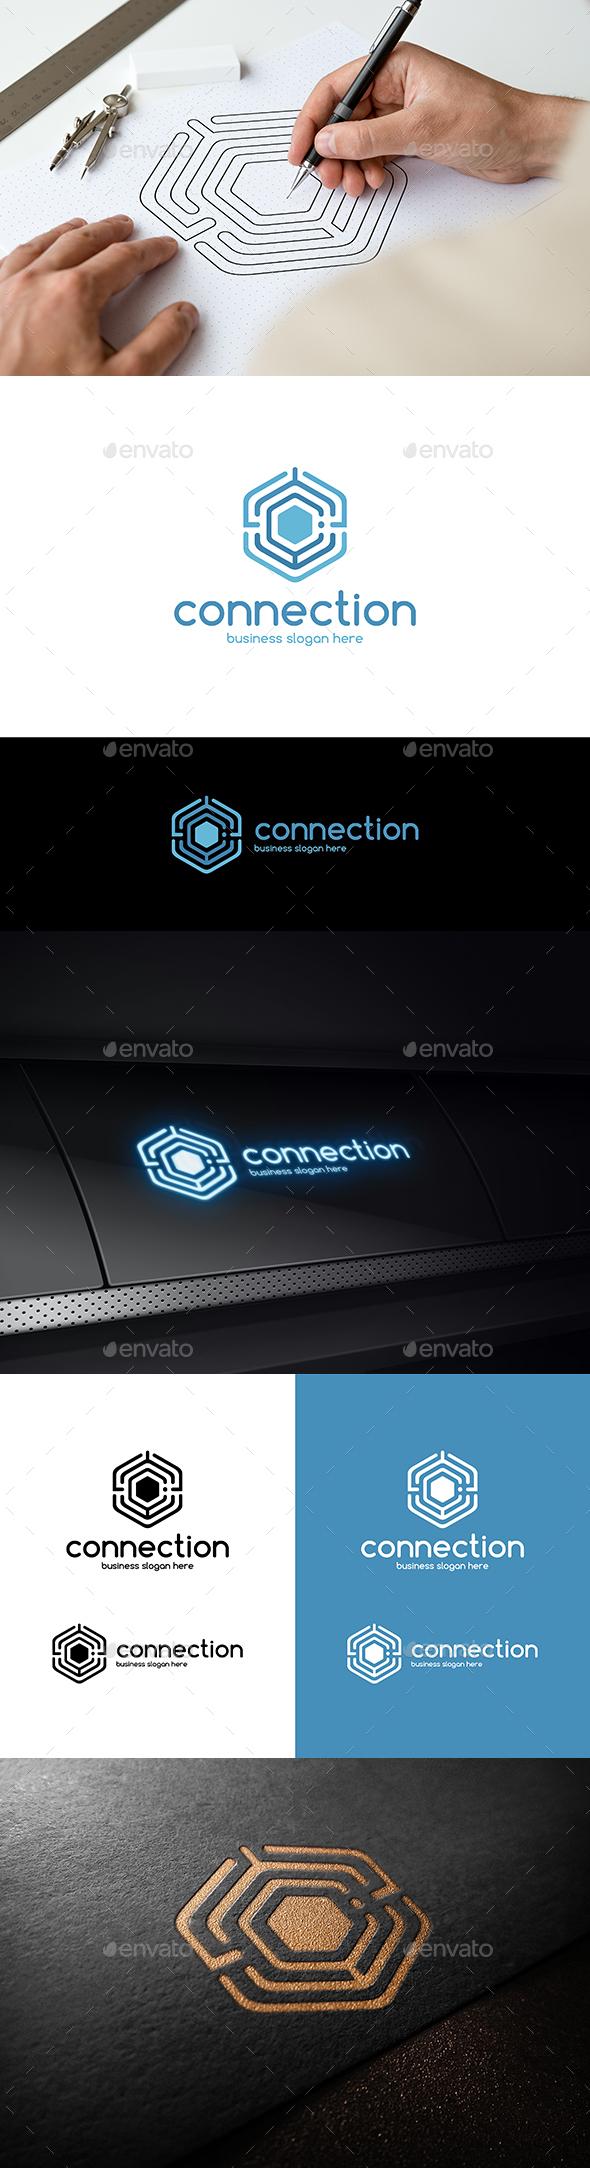 Connection Hexagon Technologies Logo - Letter C